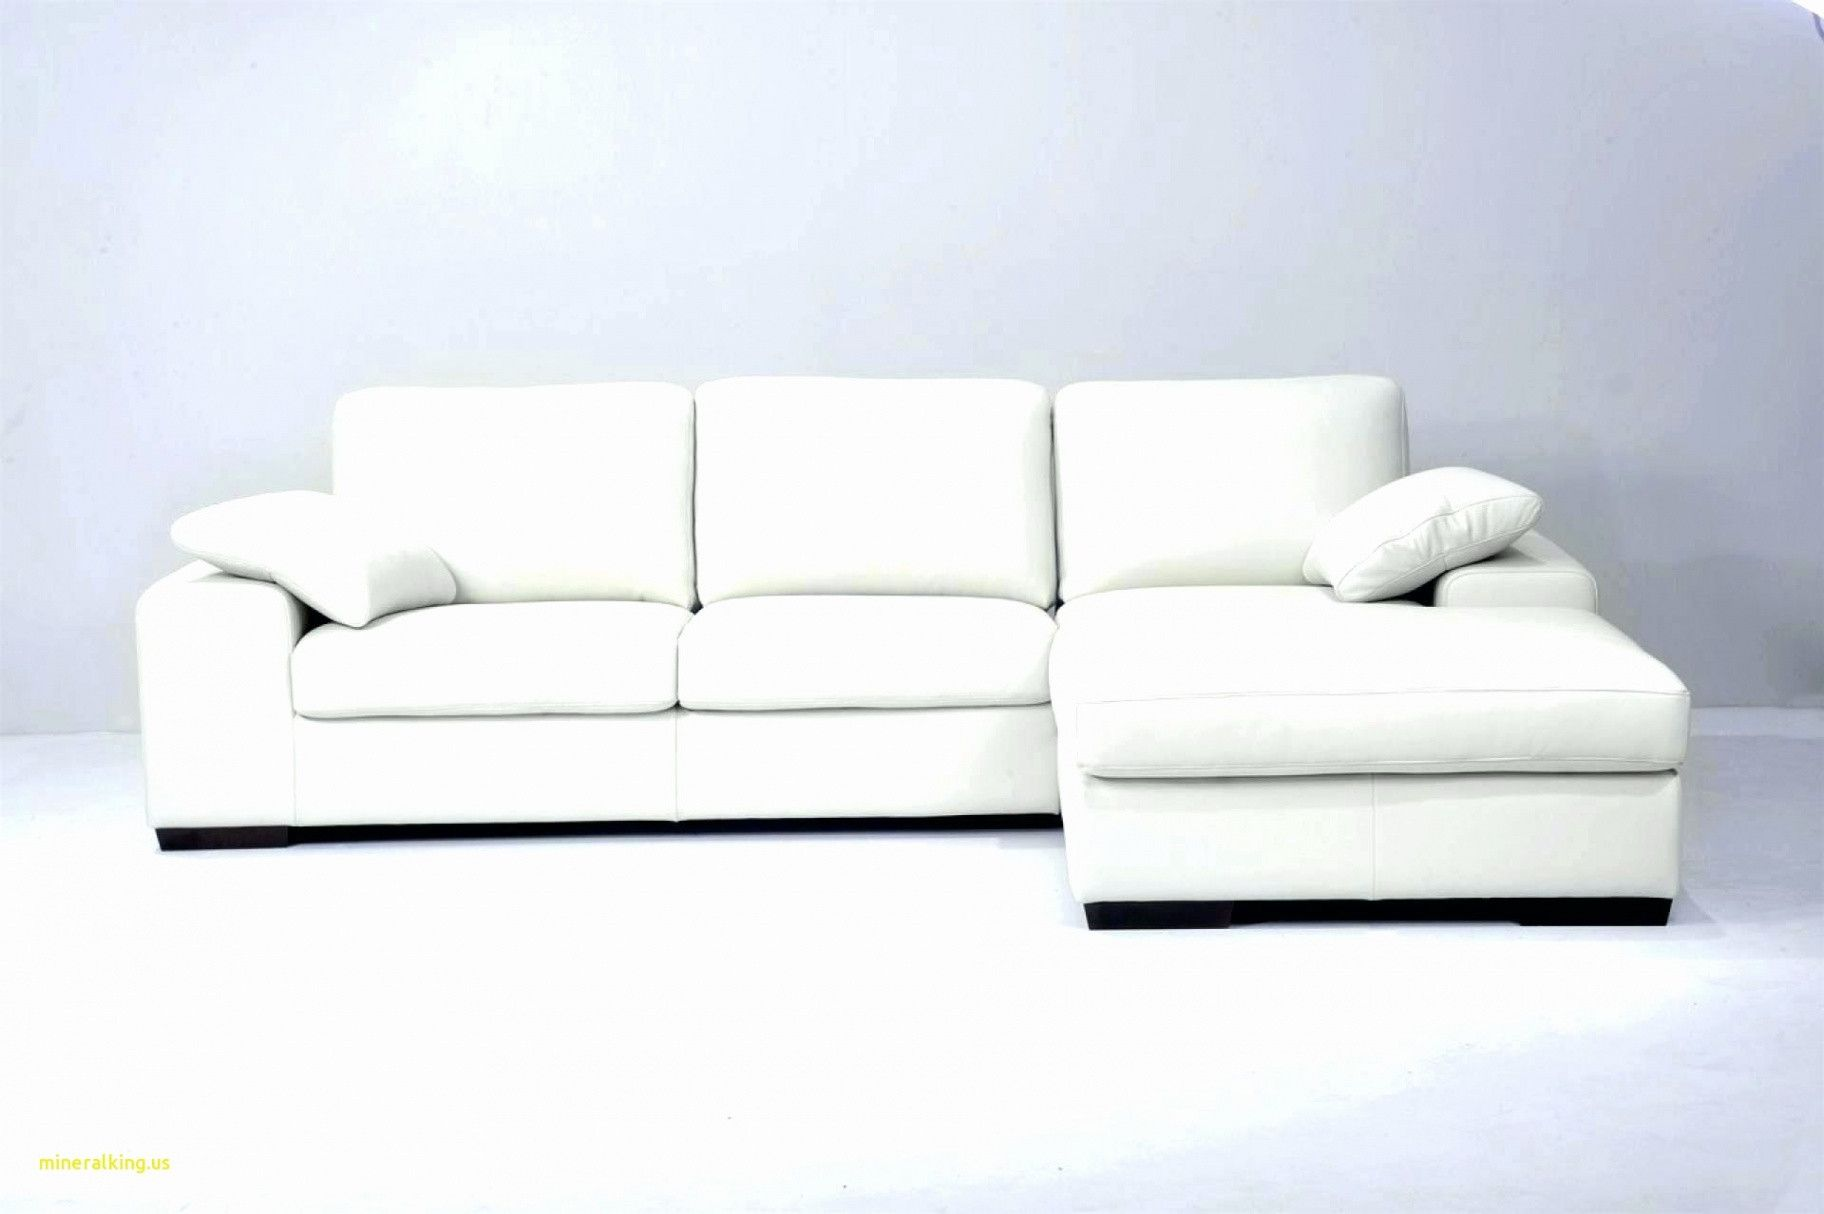 Canapé Ikea Convertible 2 Places 28 inspirant recouvrir un canapé inspirations - couvrir